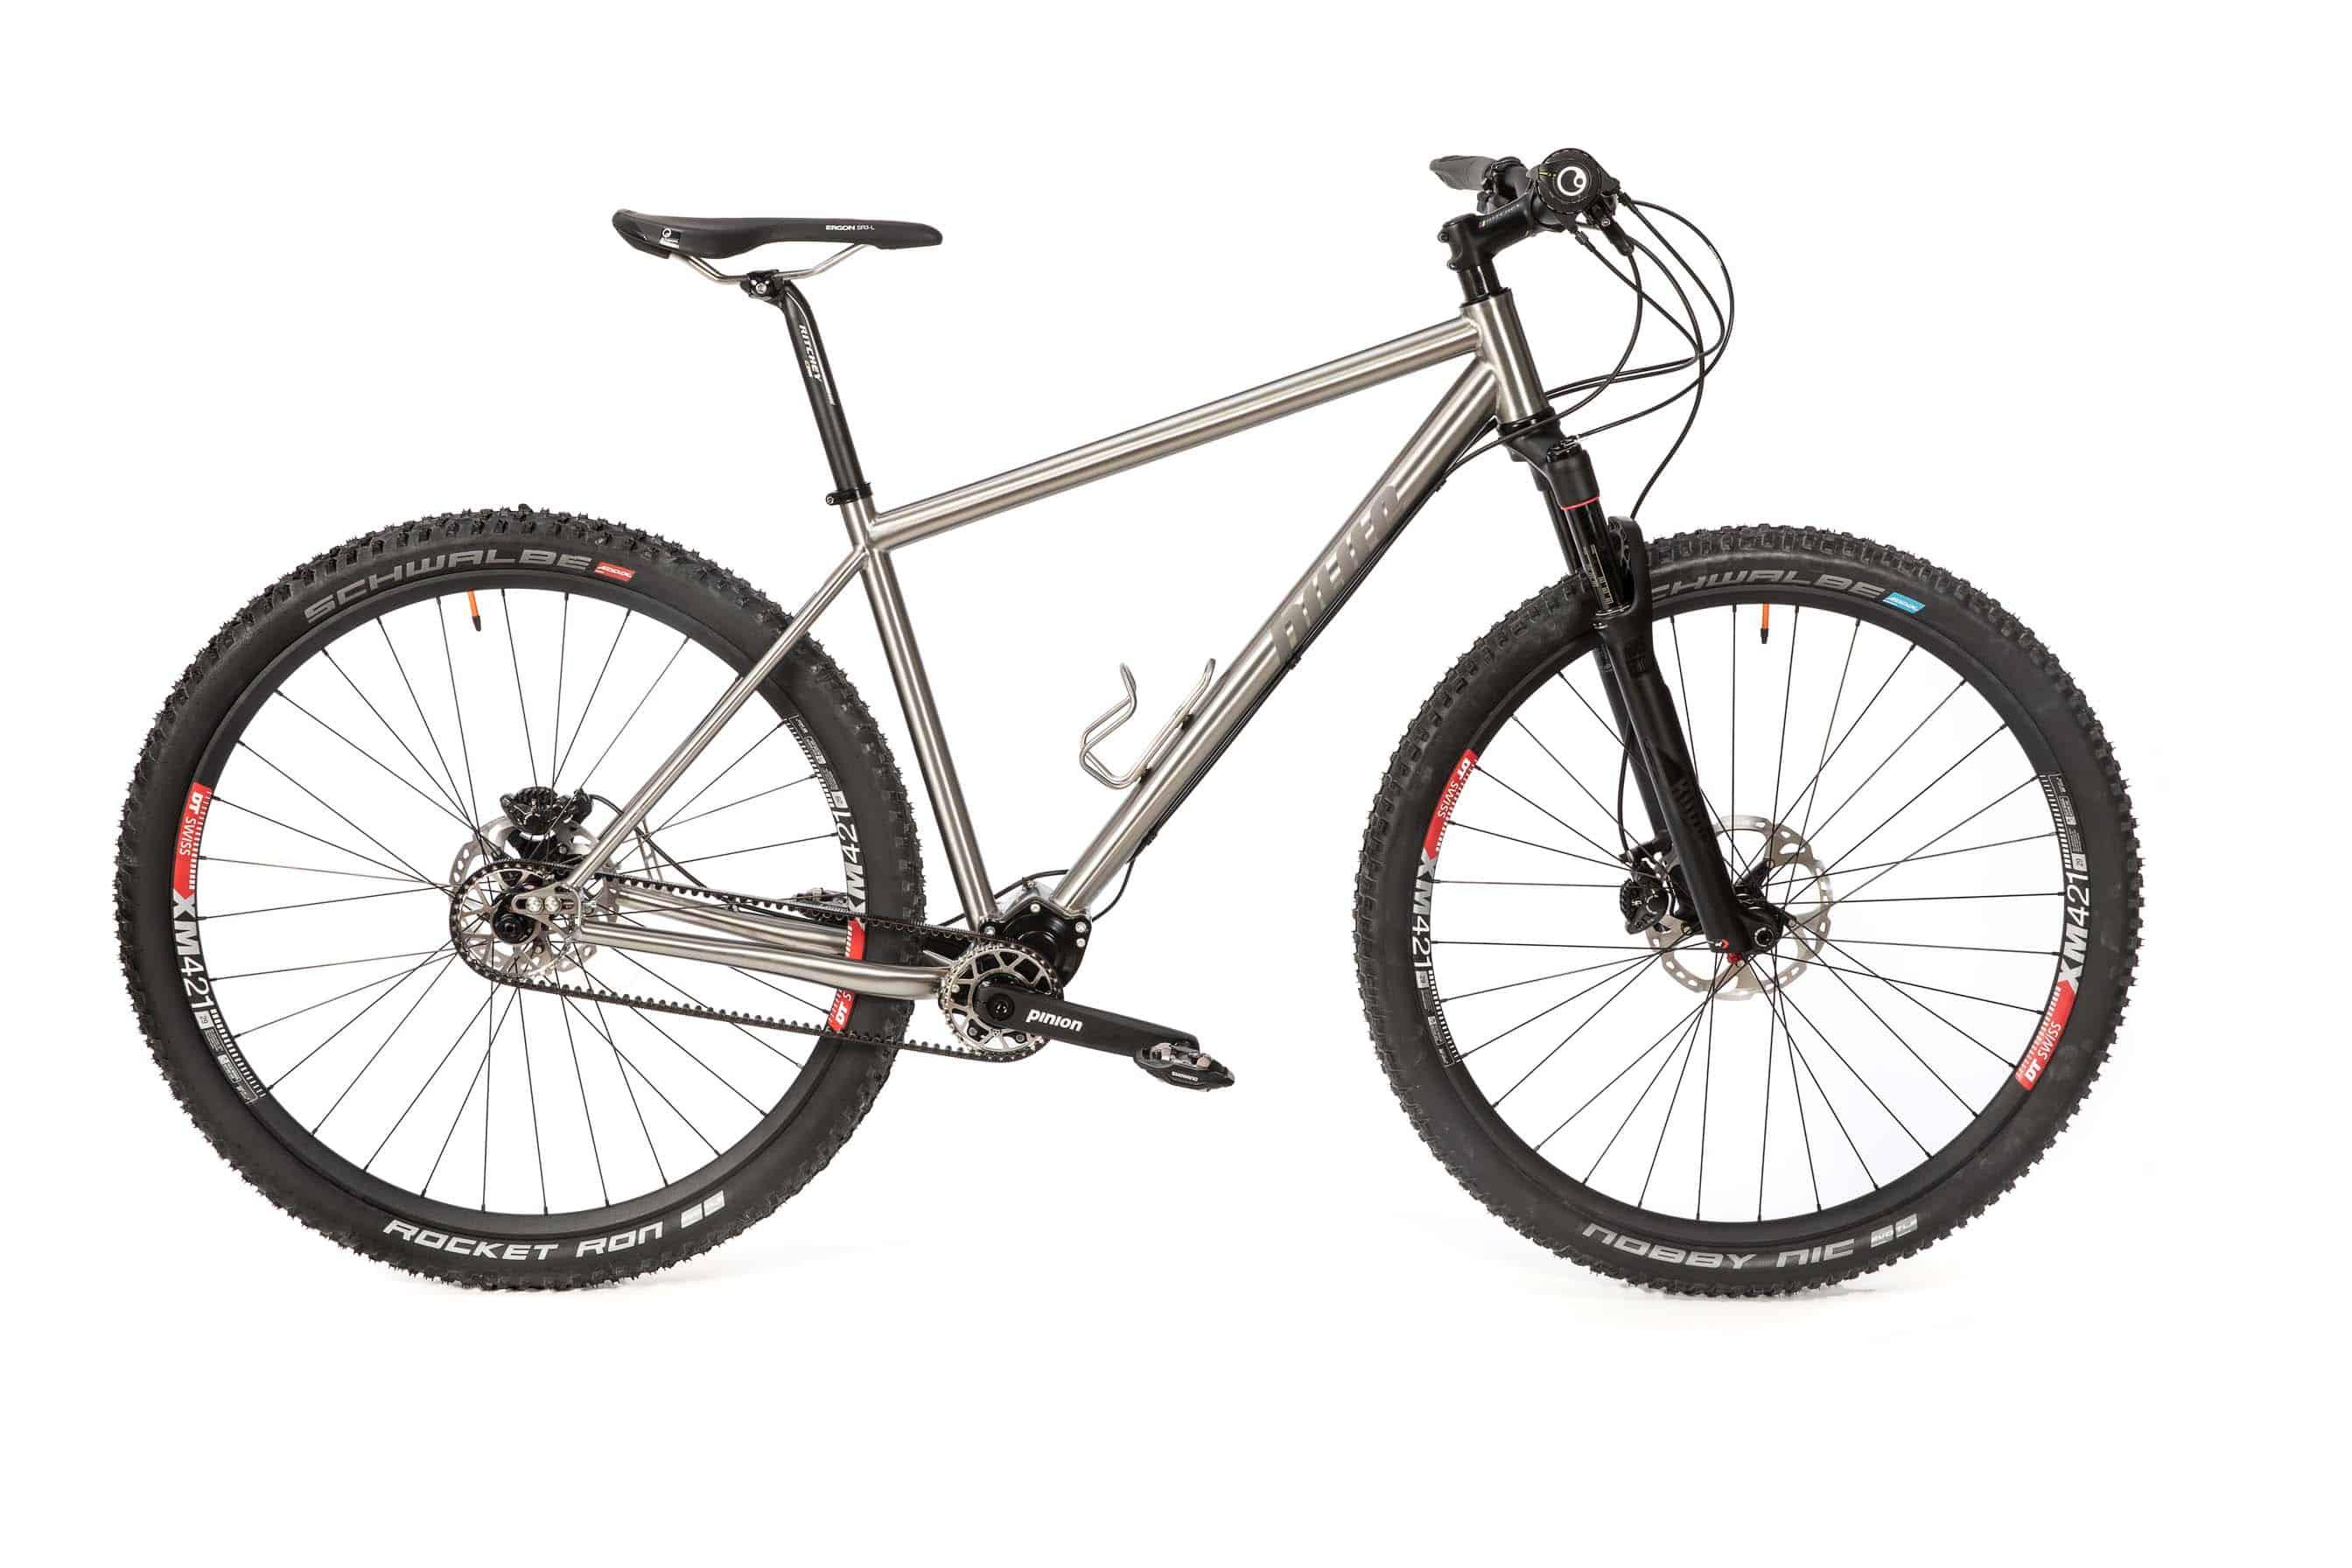 Pinion_Titan_MTB_Mountainbike_11